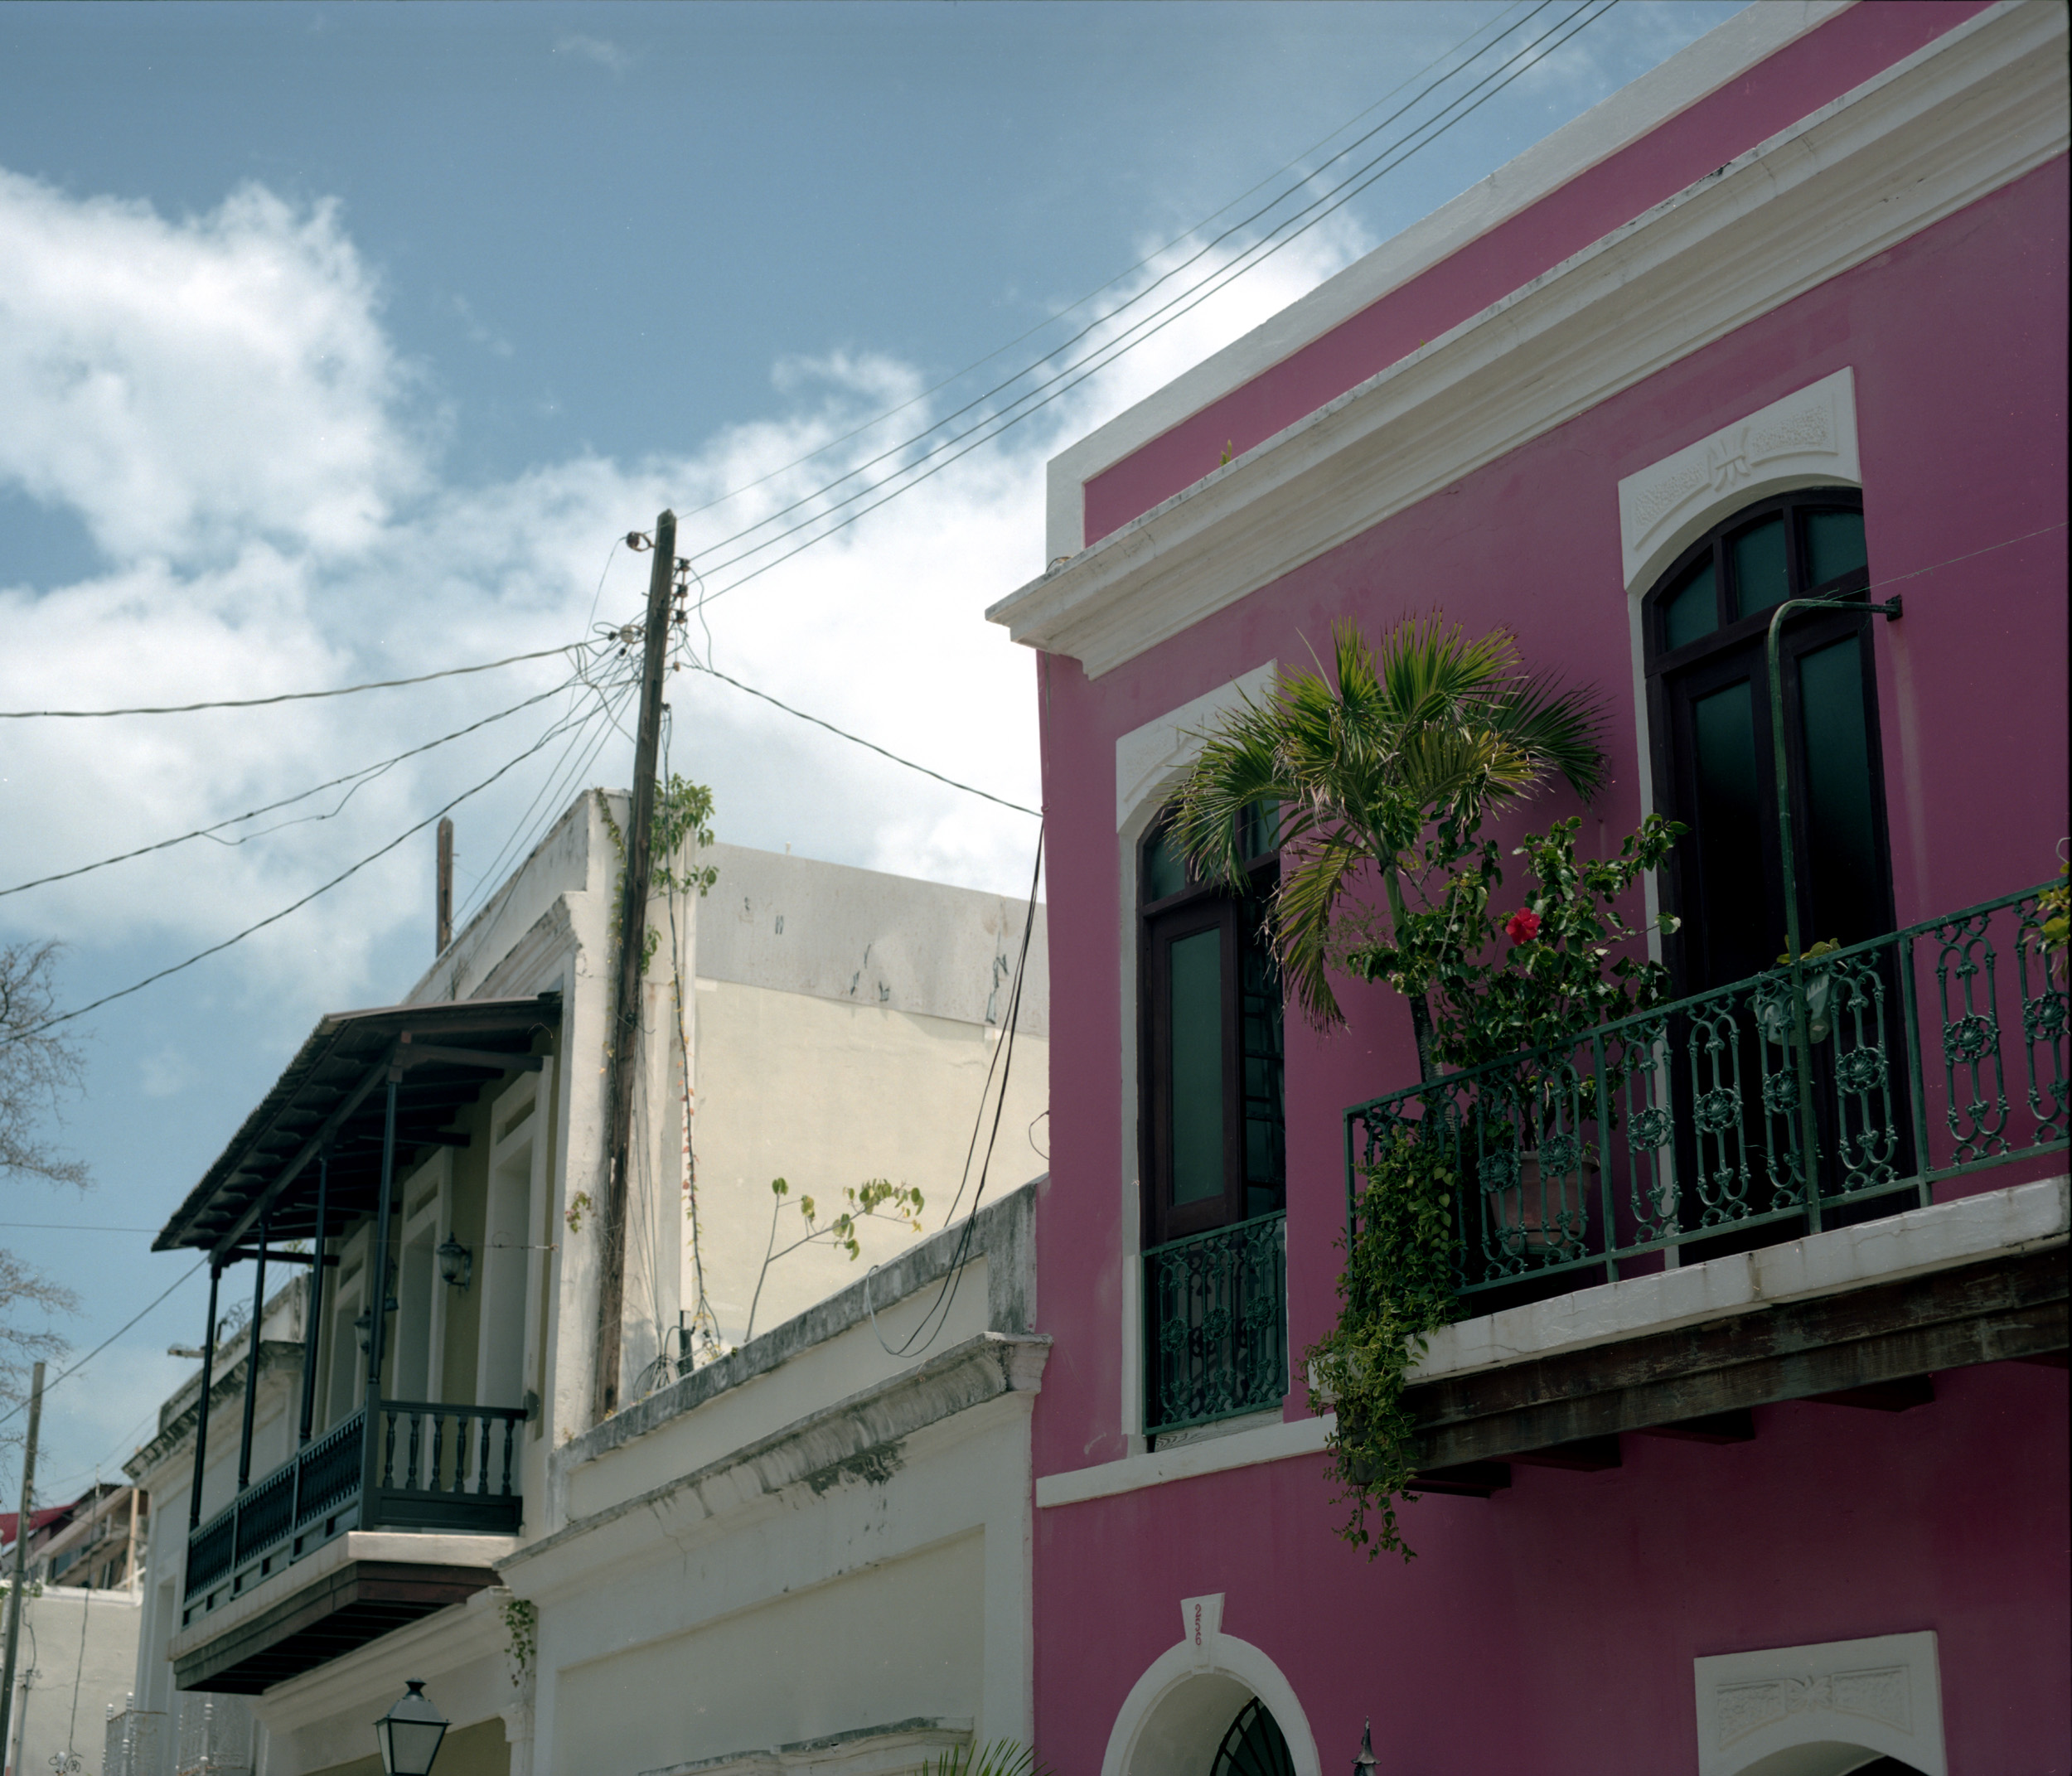 Puerto Rico019-Recovered.jpg